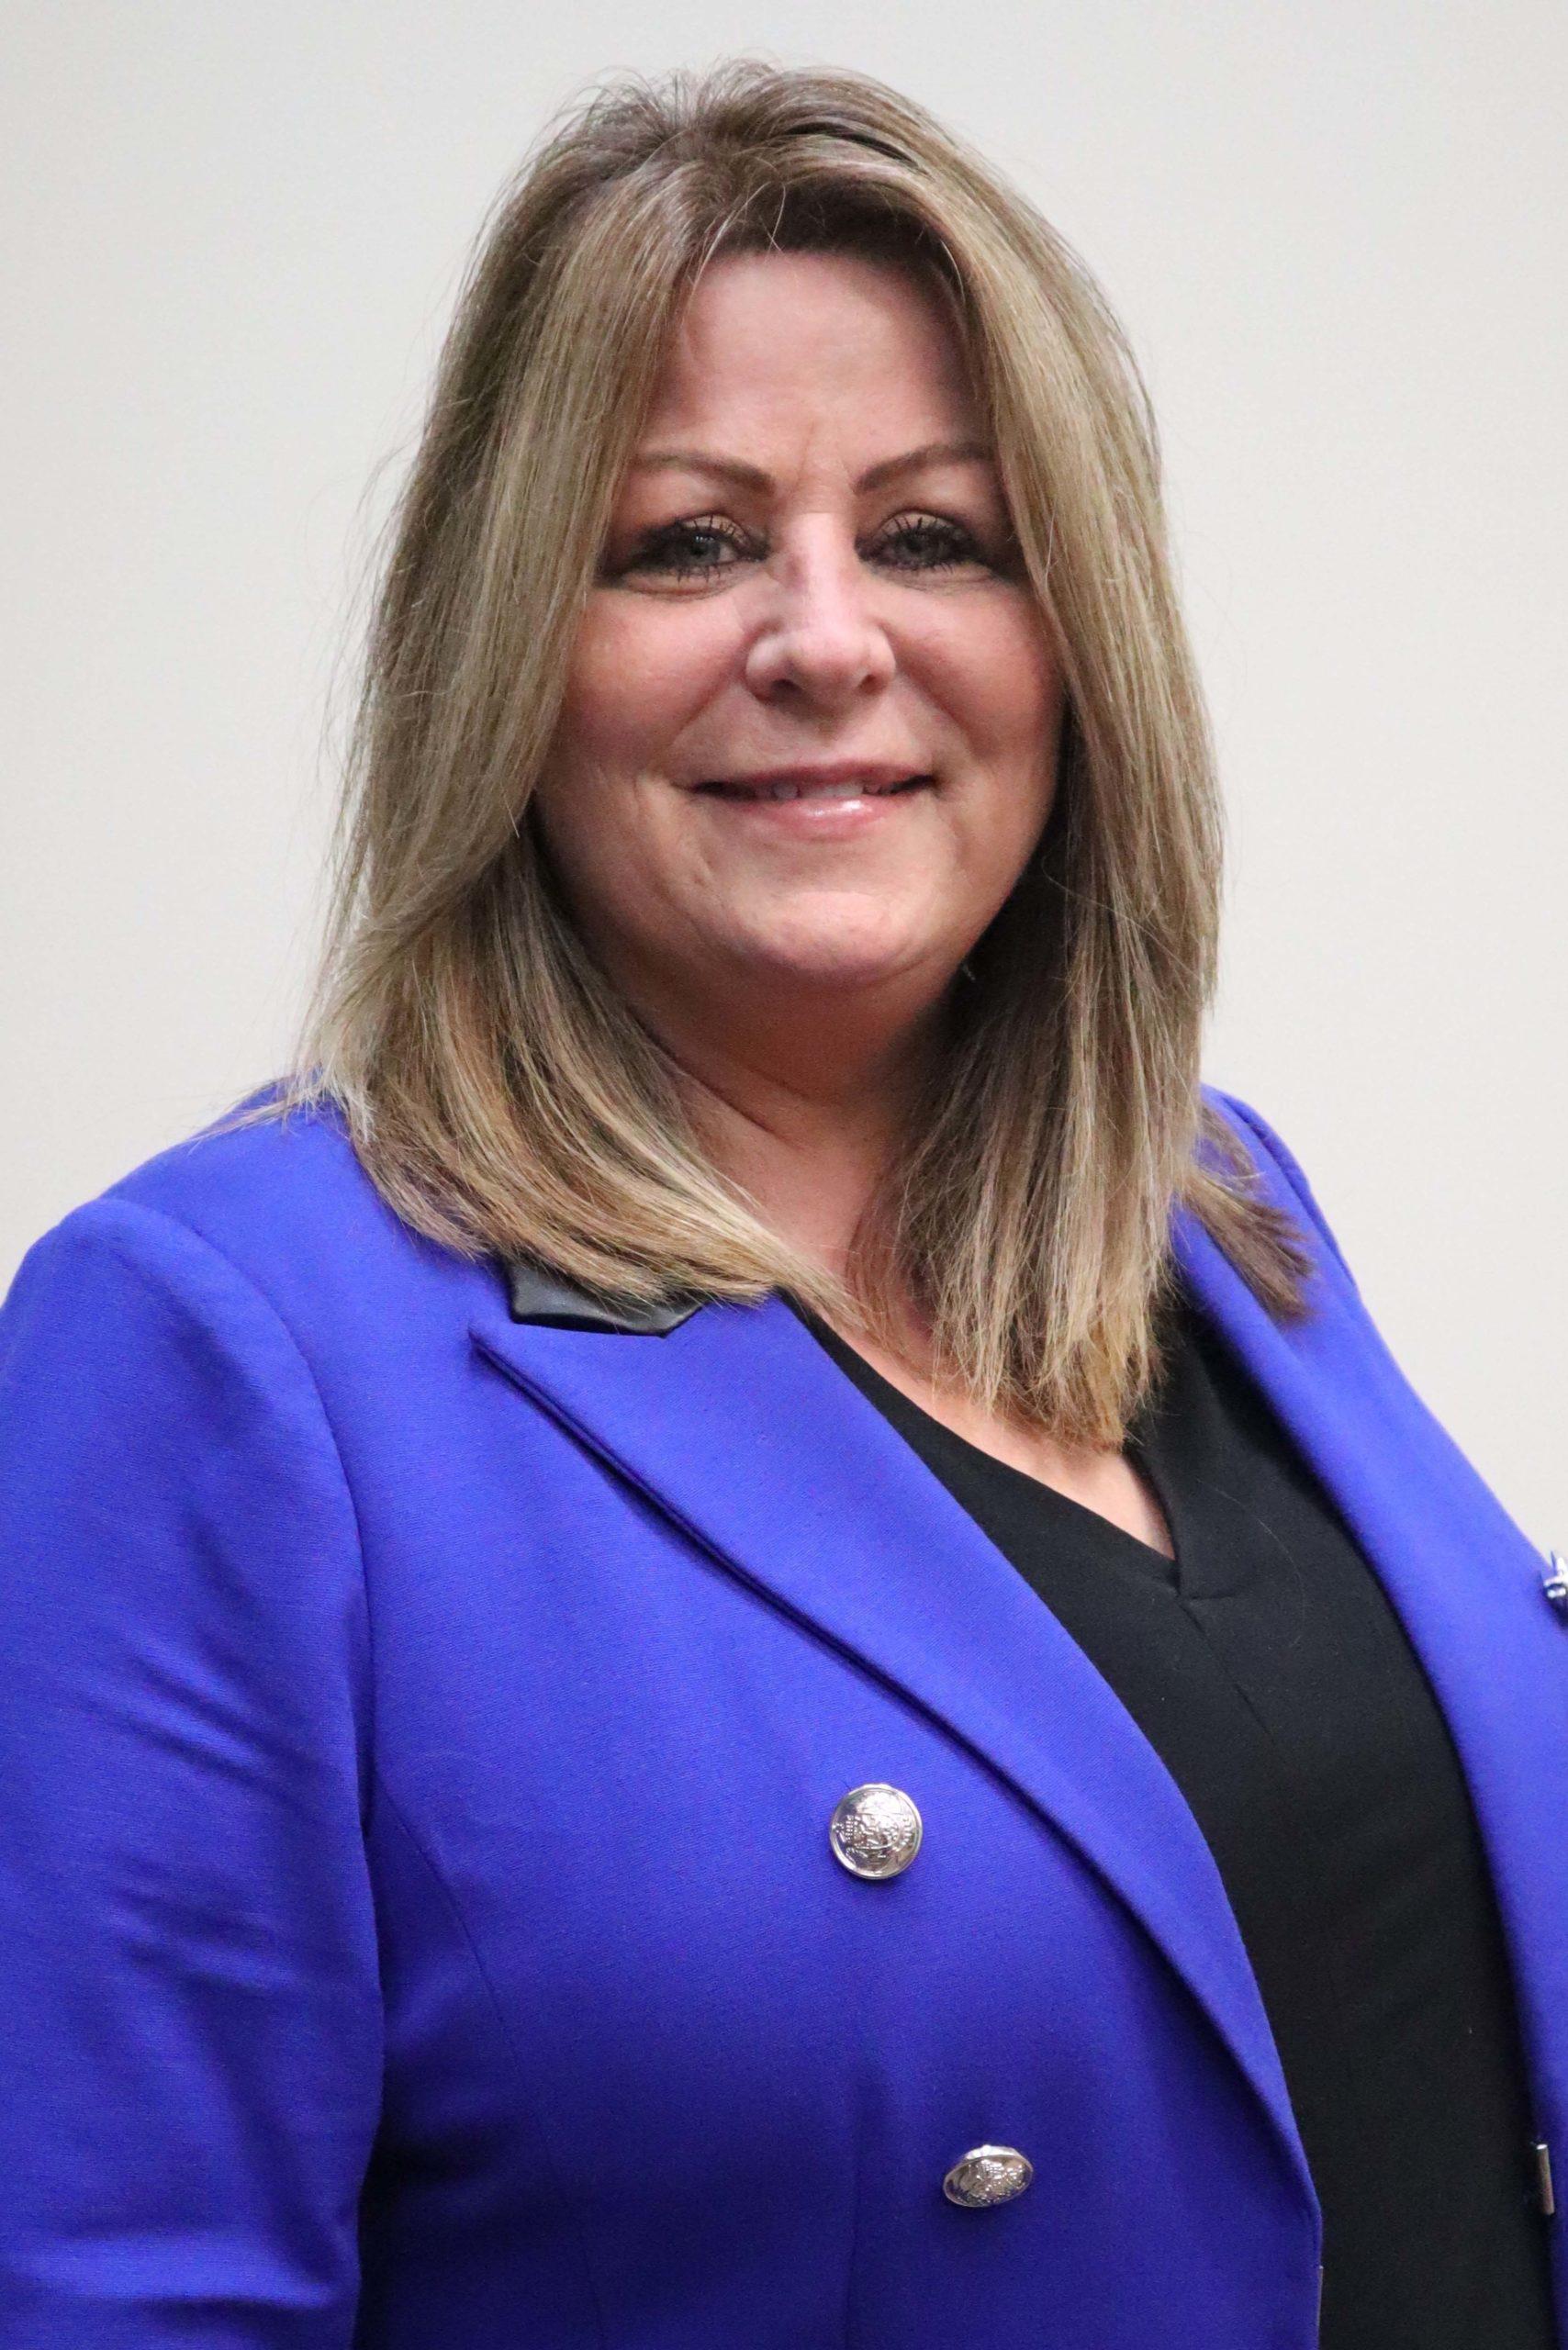 Sheila Sieradzki